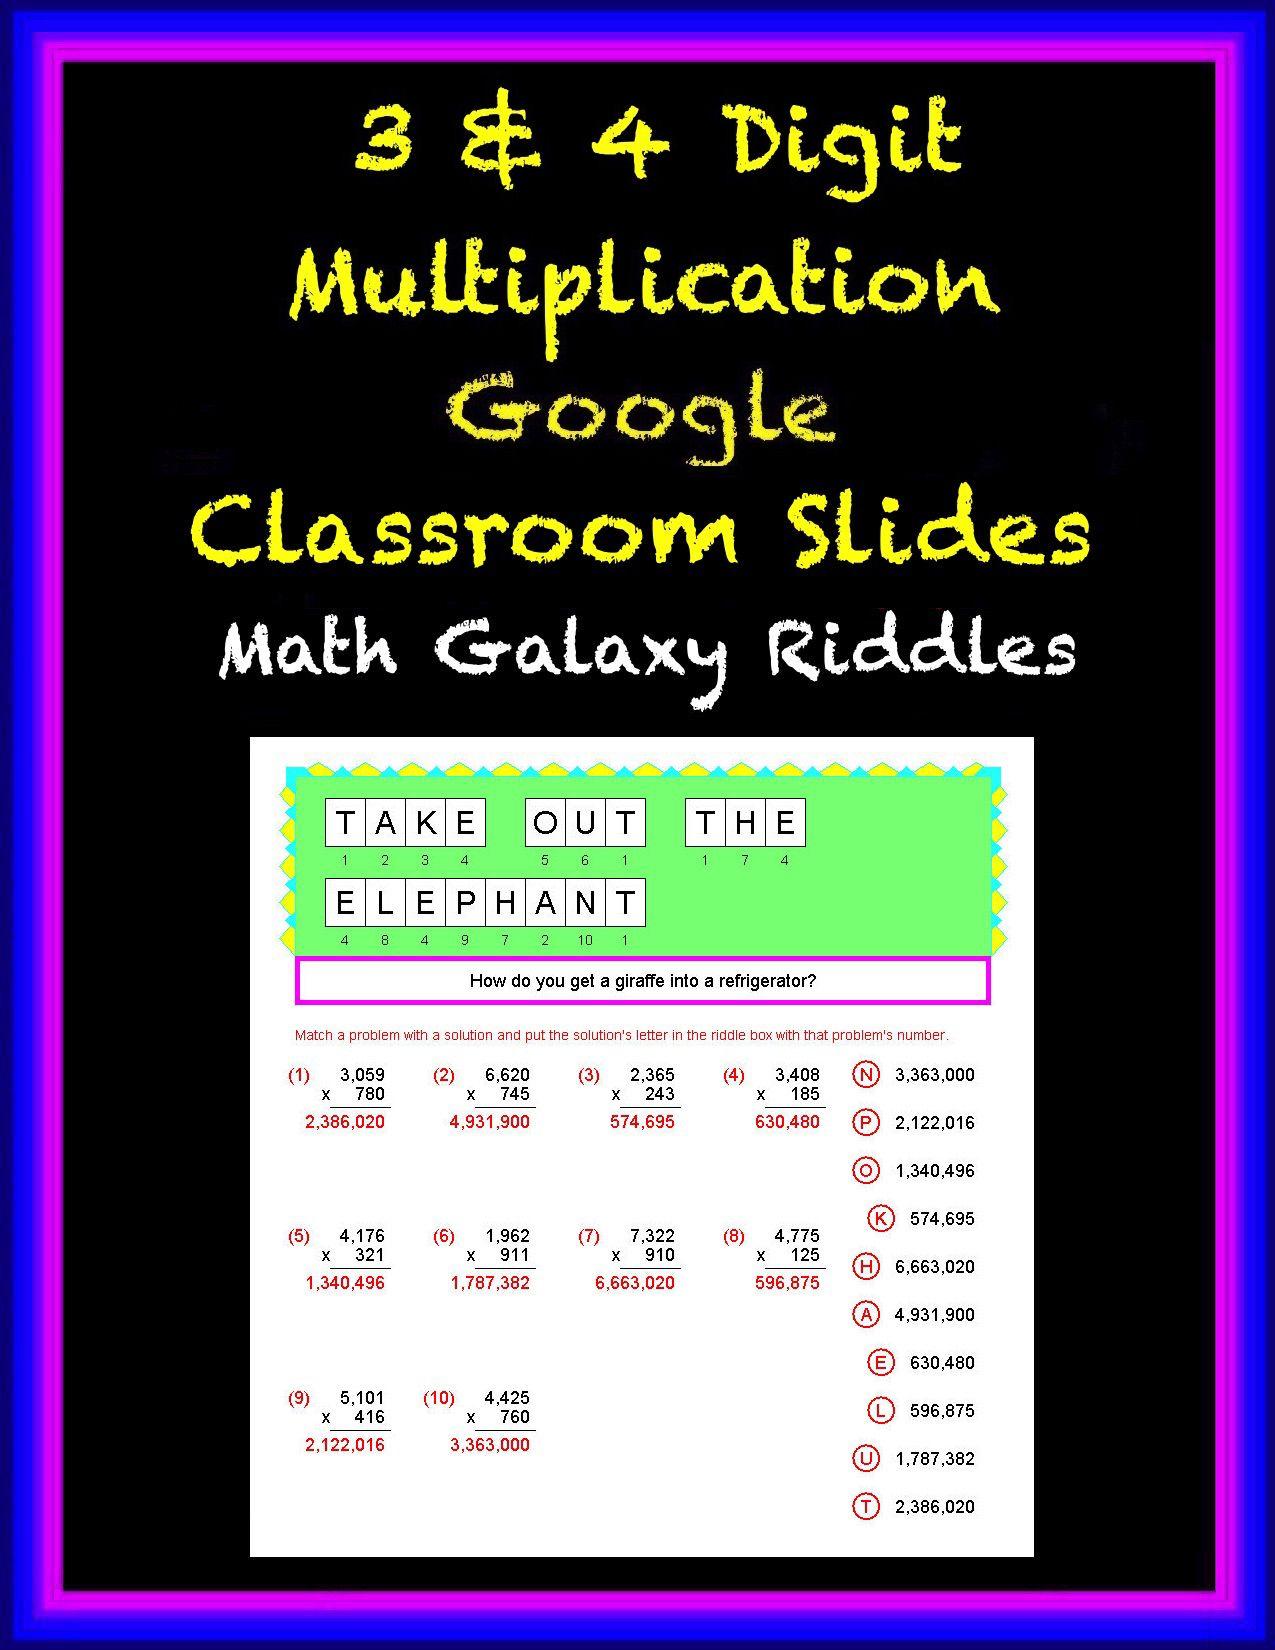 3 Amp 4 Digit Multiplication